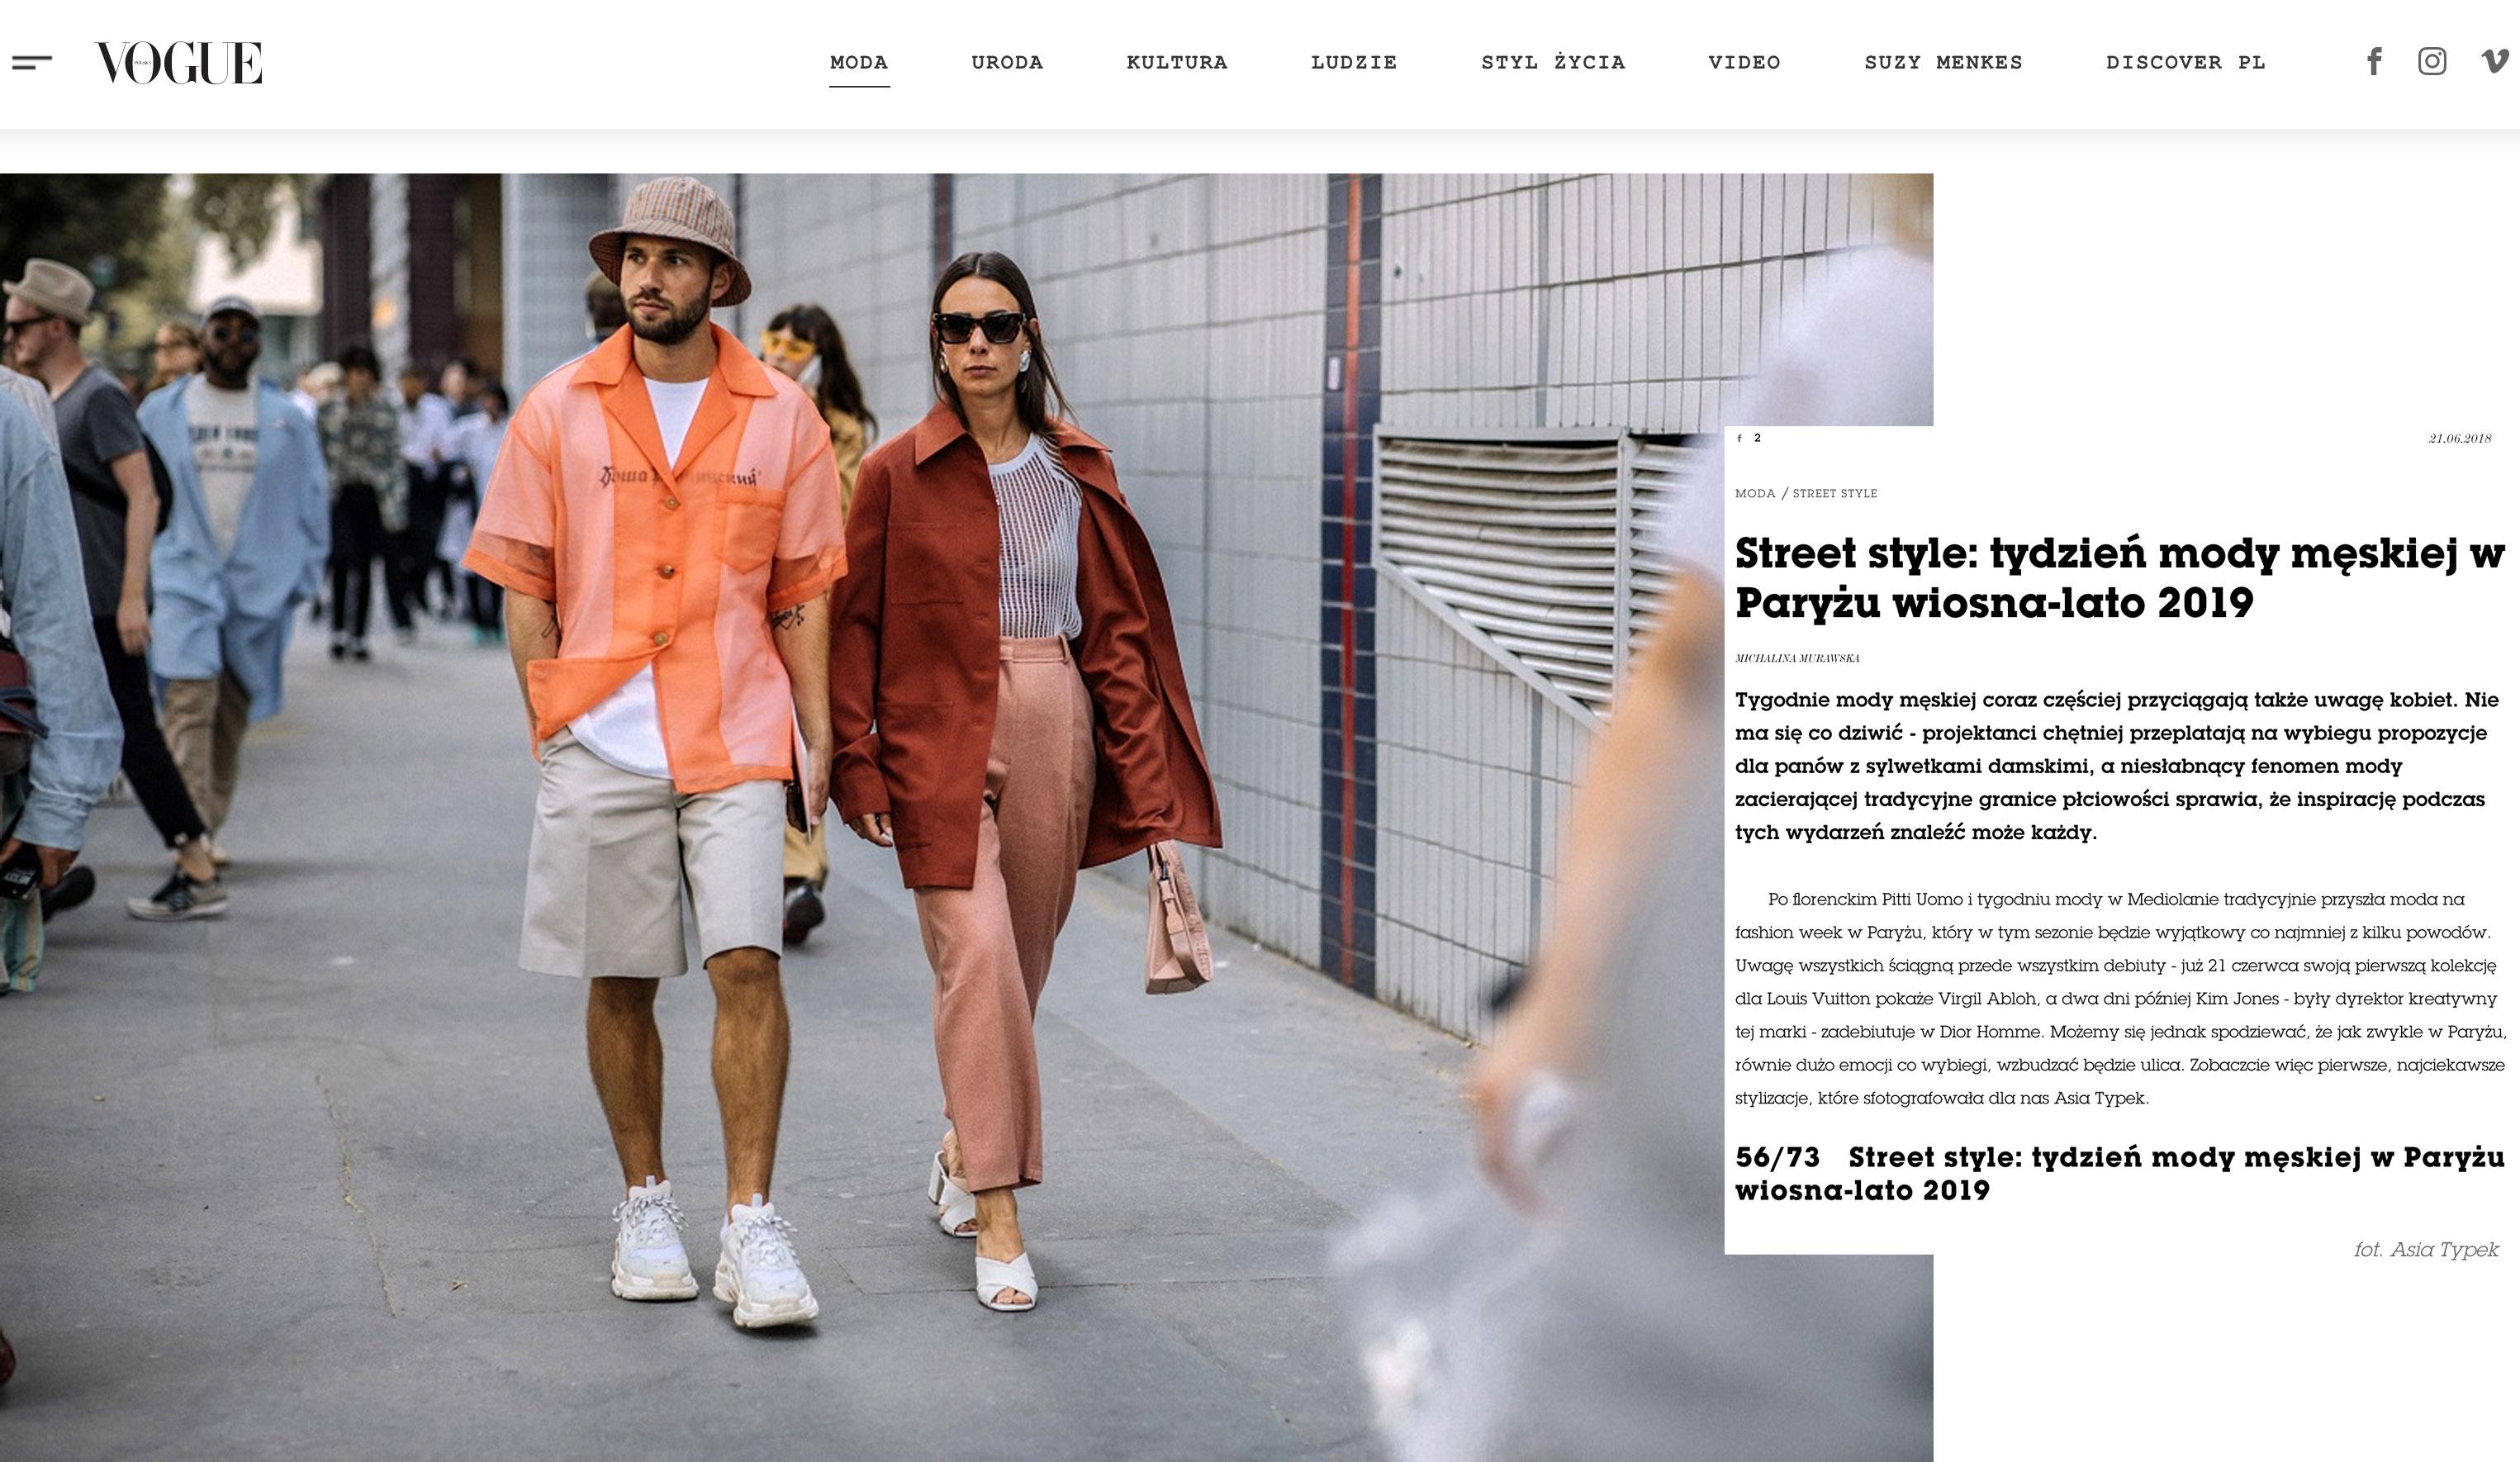 Vogue Polska asia typek